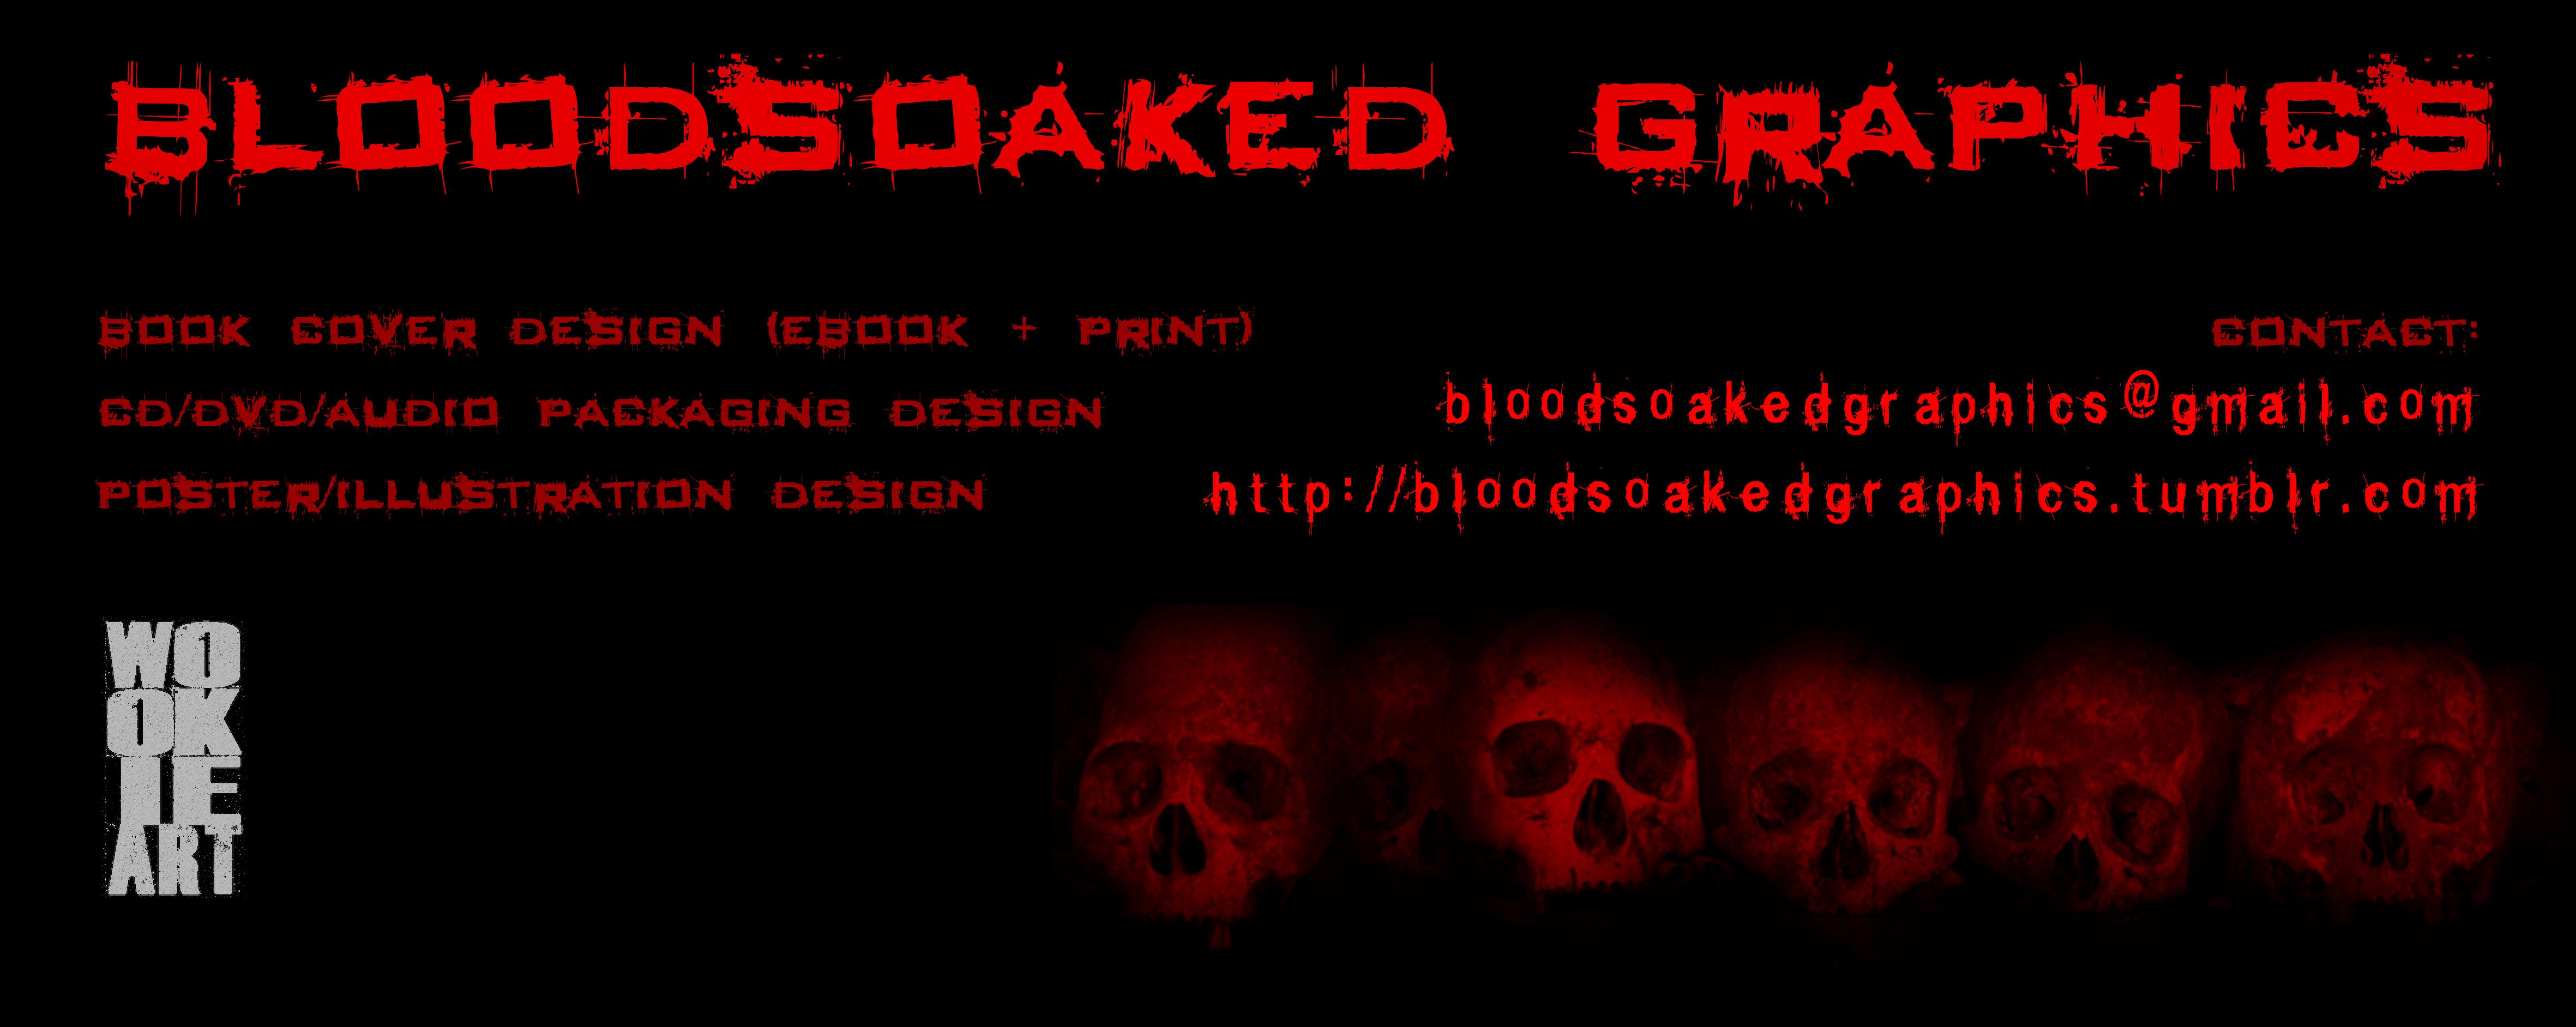 Horror Book Cover Ideas : William cook writer book cover design